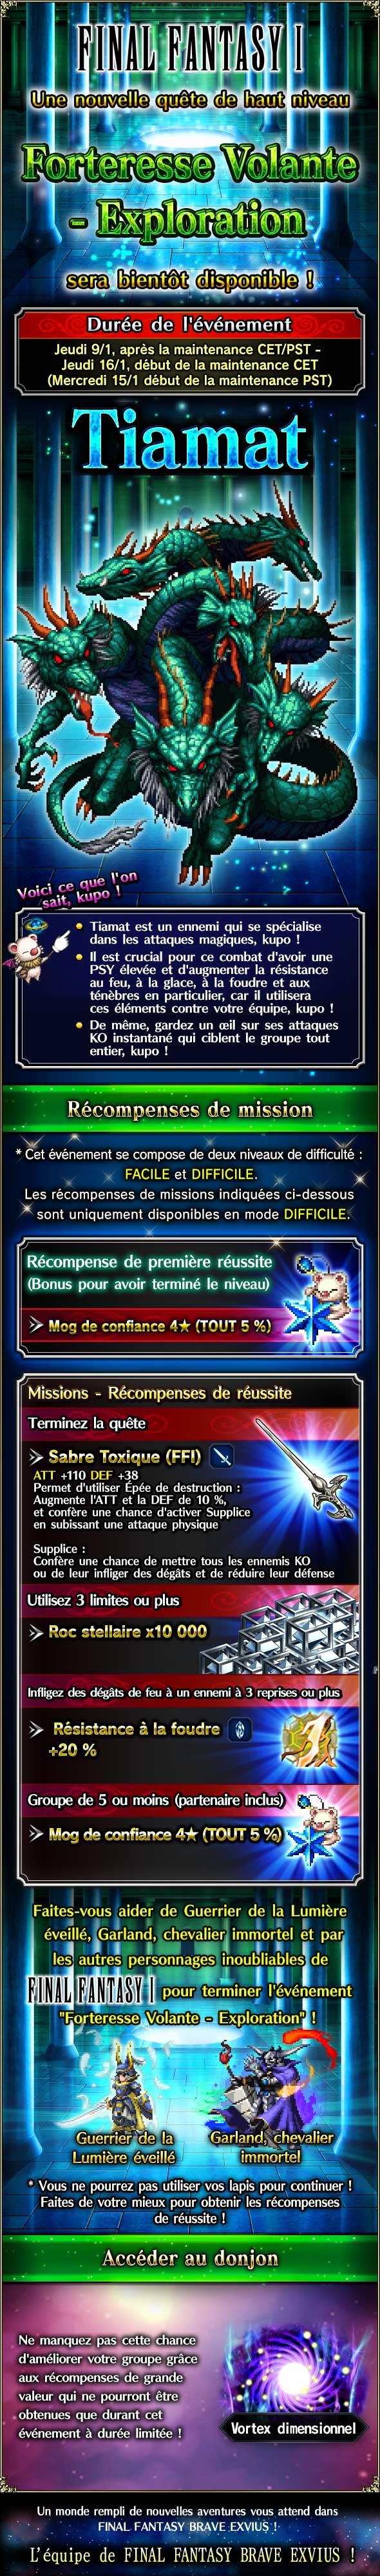 Trial MK FFI - Forteresse Volante (Exploration) - du 09/01 au 16/01/20 20200107FFIFlyingFortressExploration